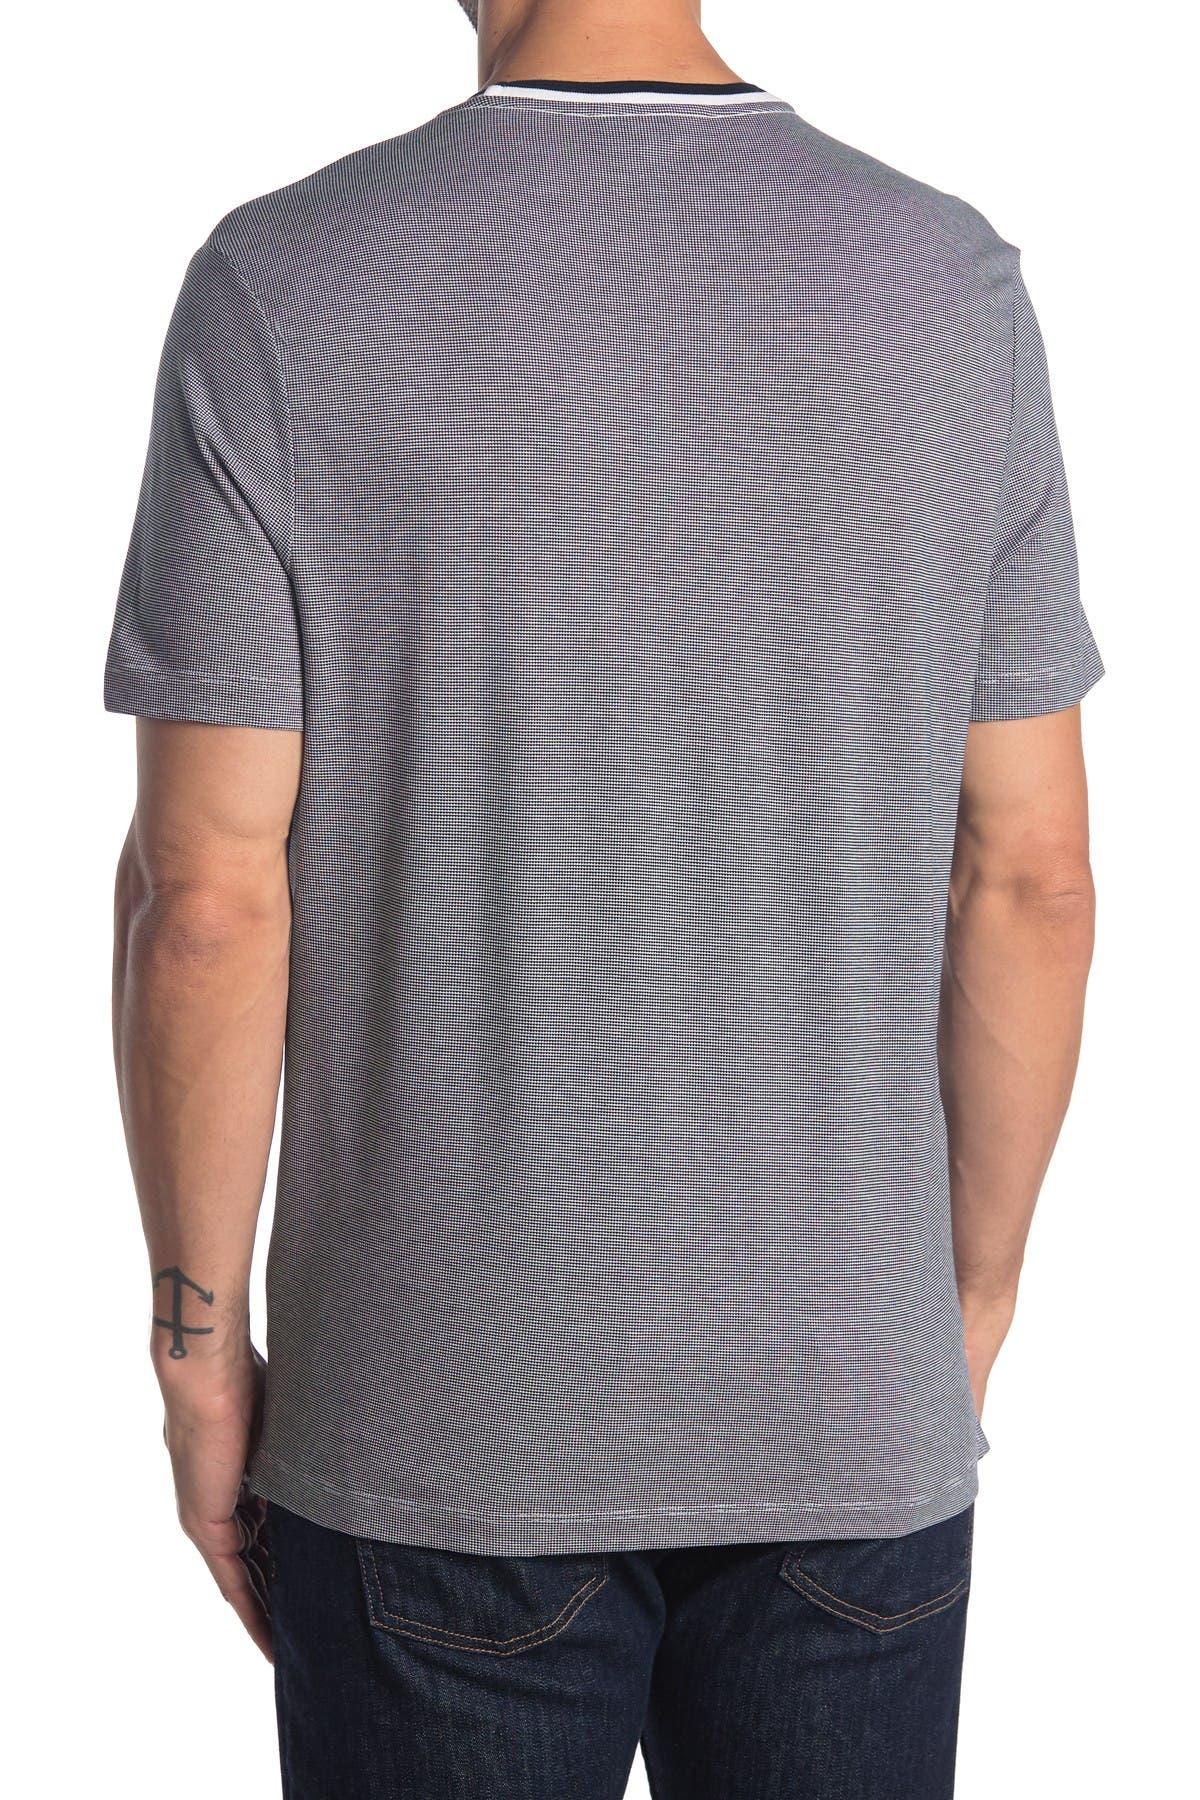 Image of Michael Kors Crew Neck T-Shirt